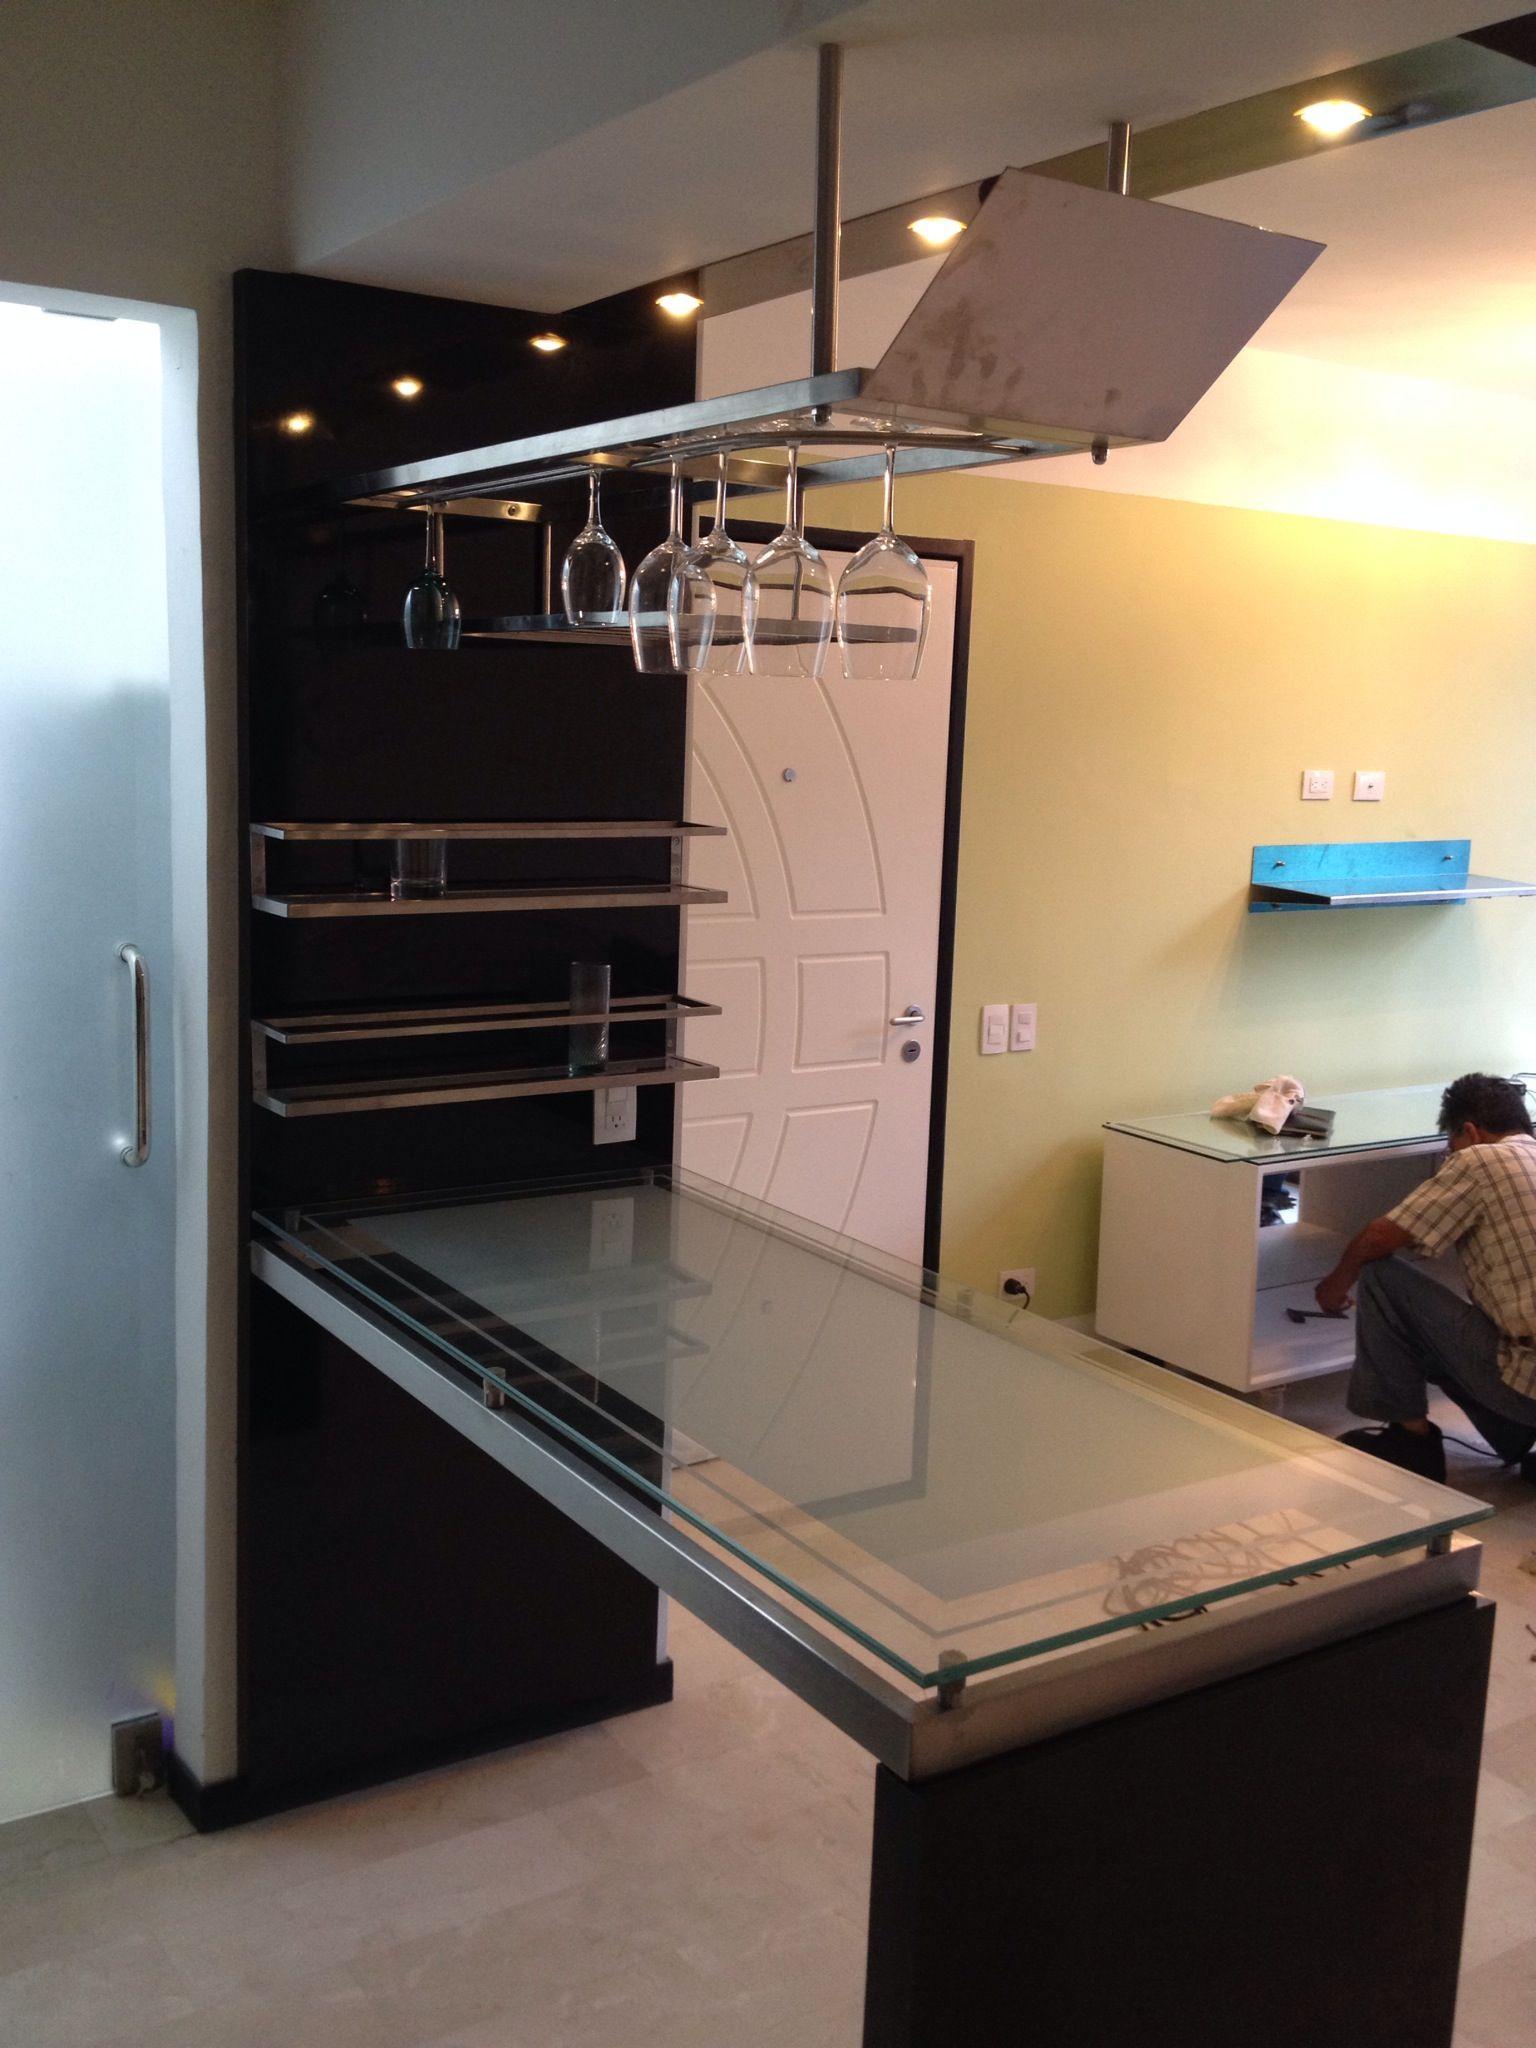 Muebles de bar peque os y minimalistas buscar con google for Cocinas modernos pequenos